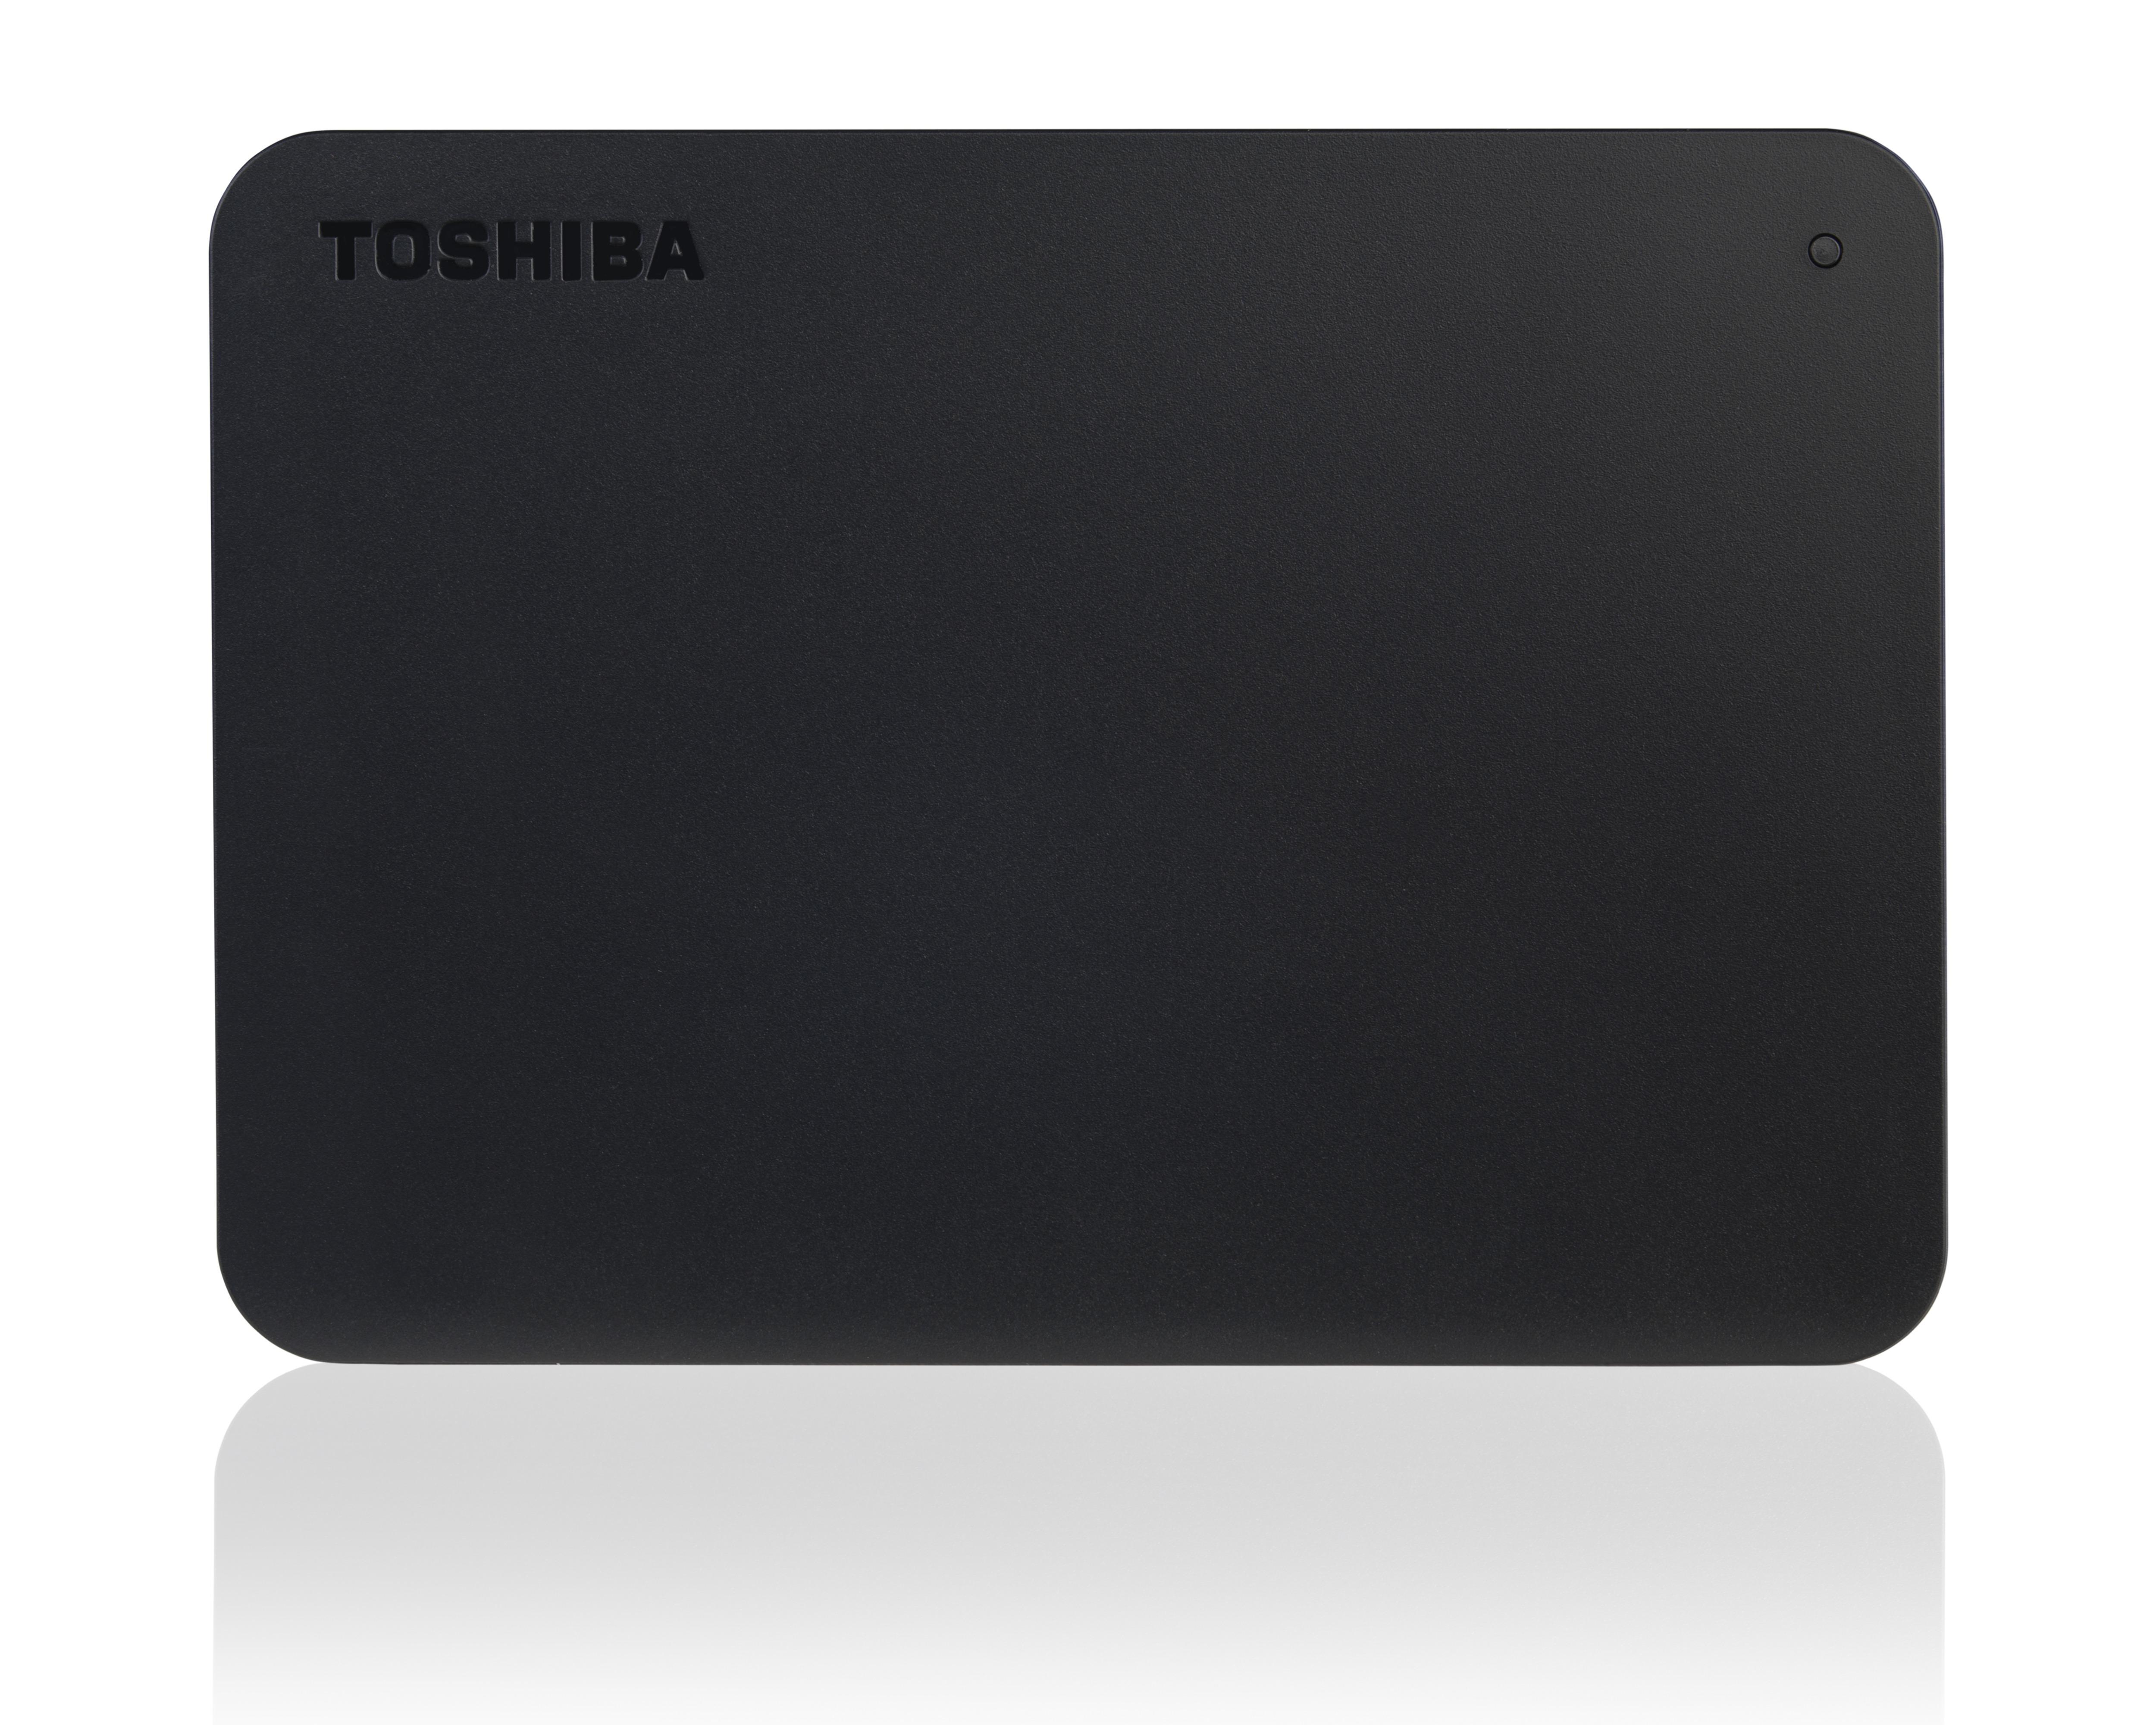 Toshiba externe harde schijf Canvio Basics (2018) 1TB zwart